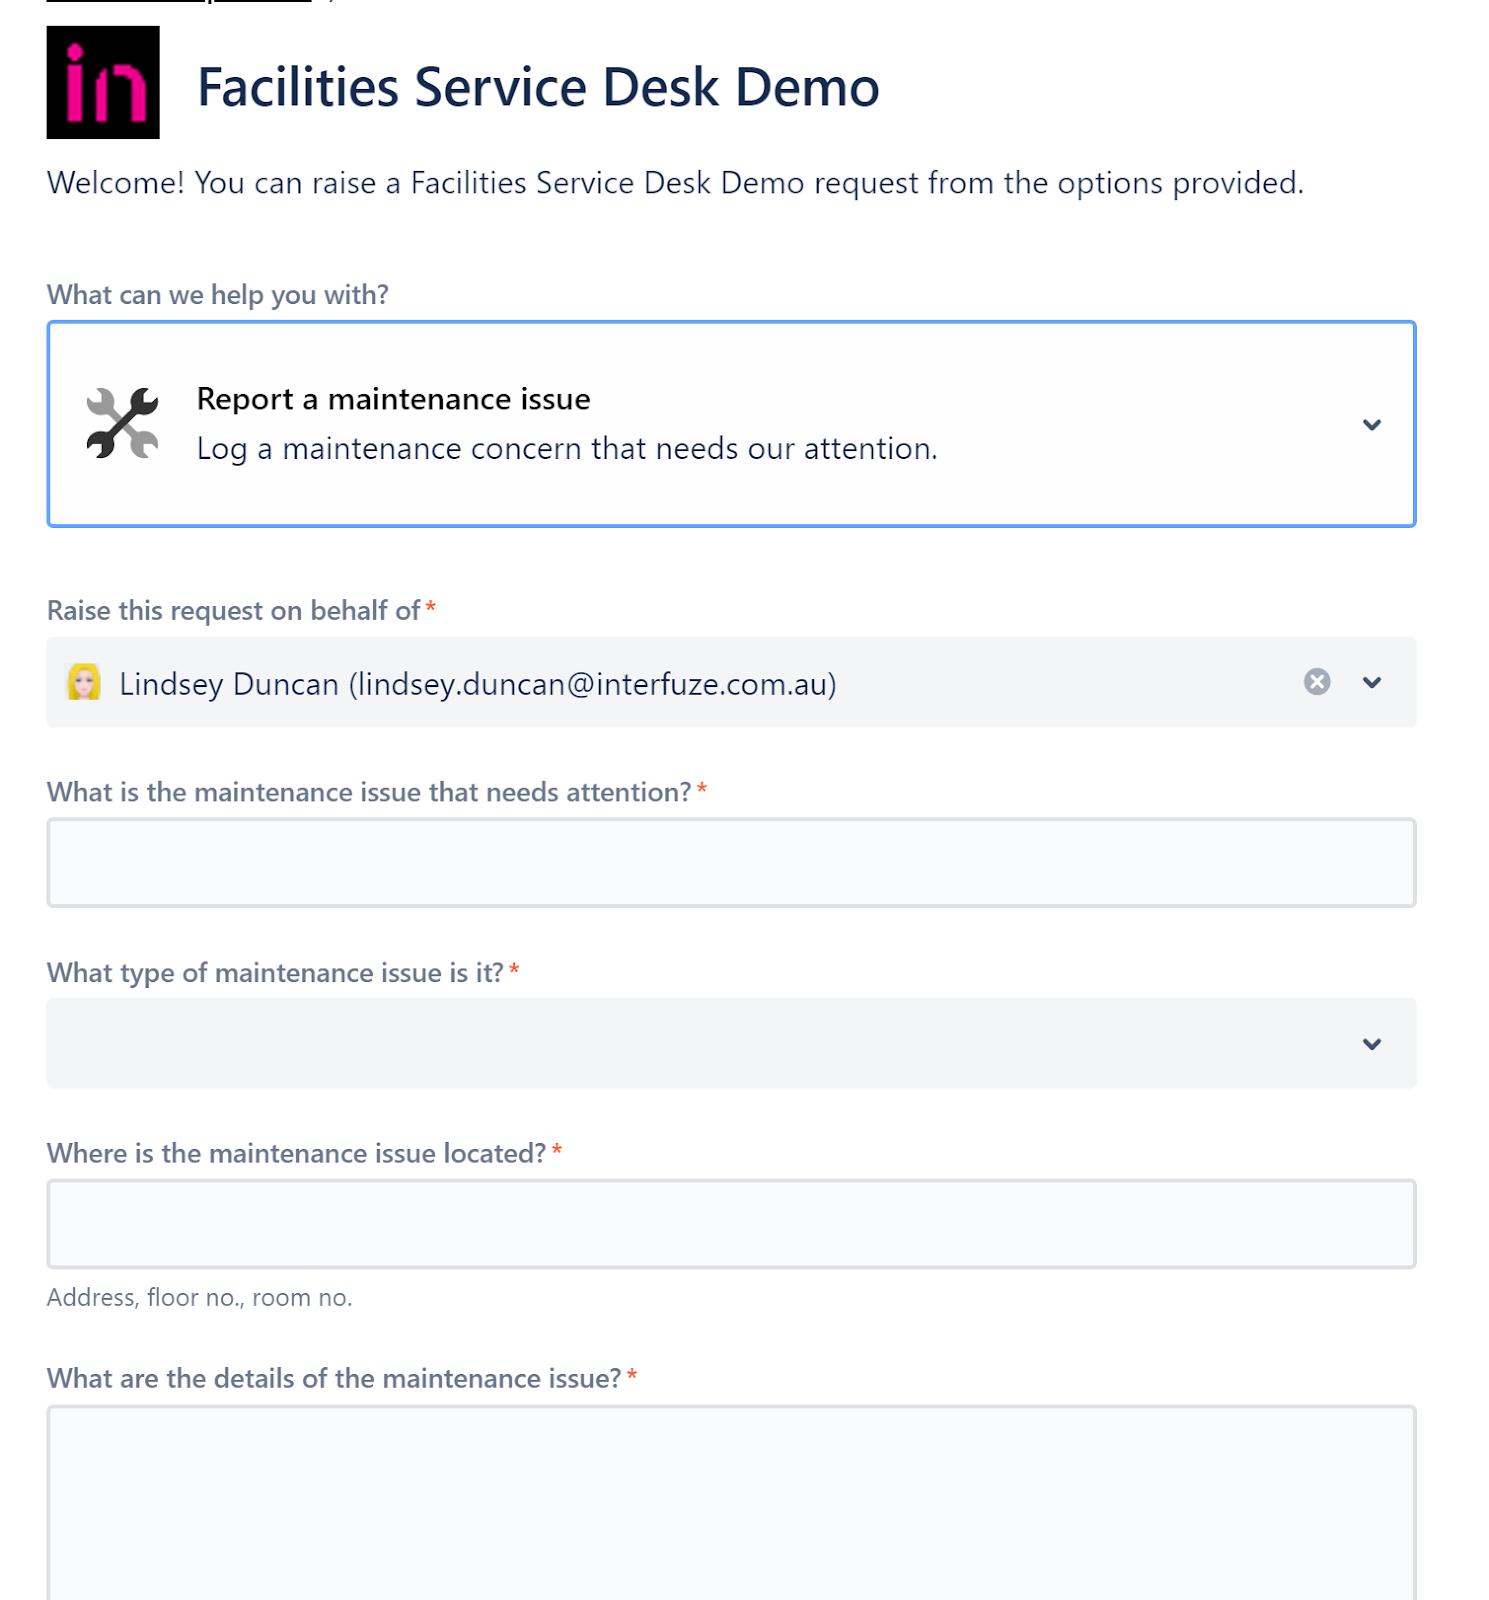 Jira Service Management Facilities Service Desk Demo